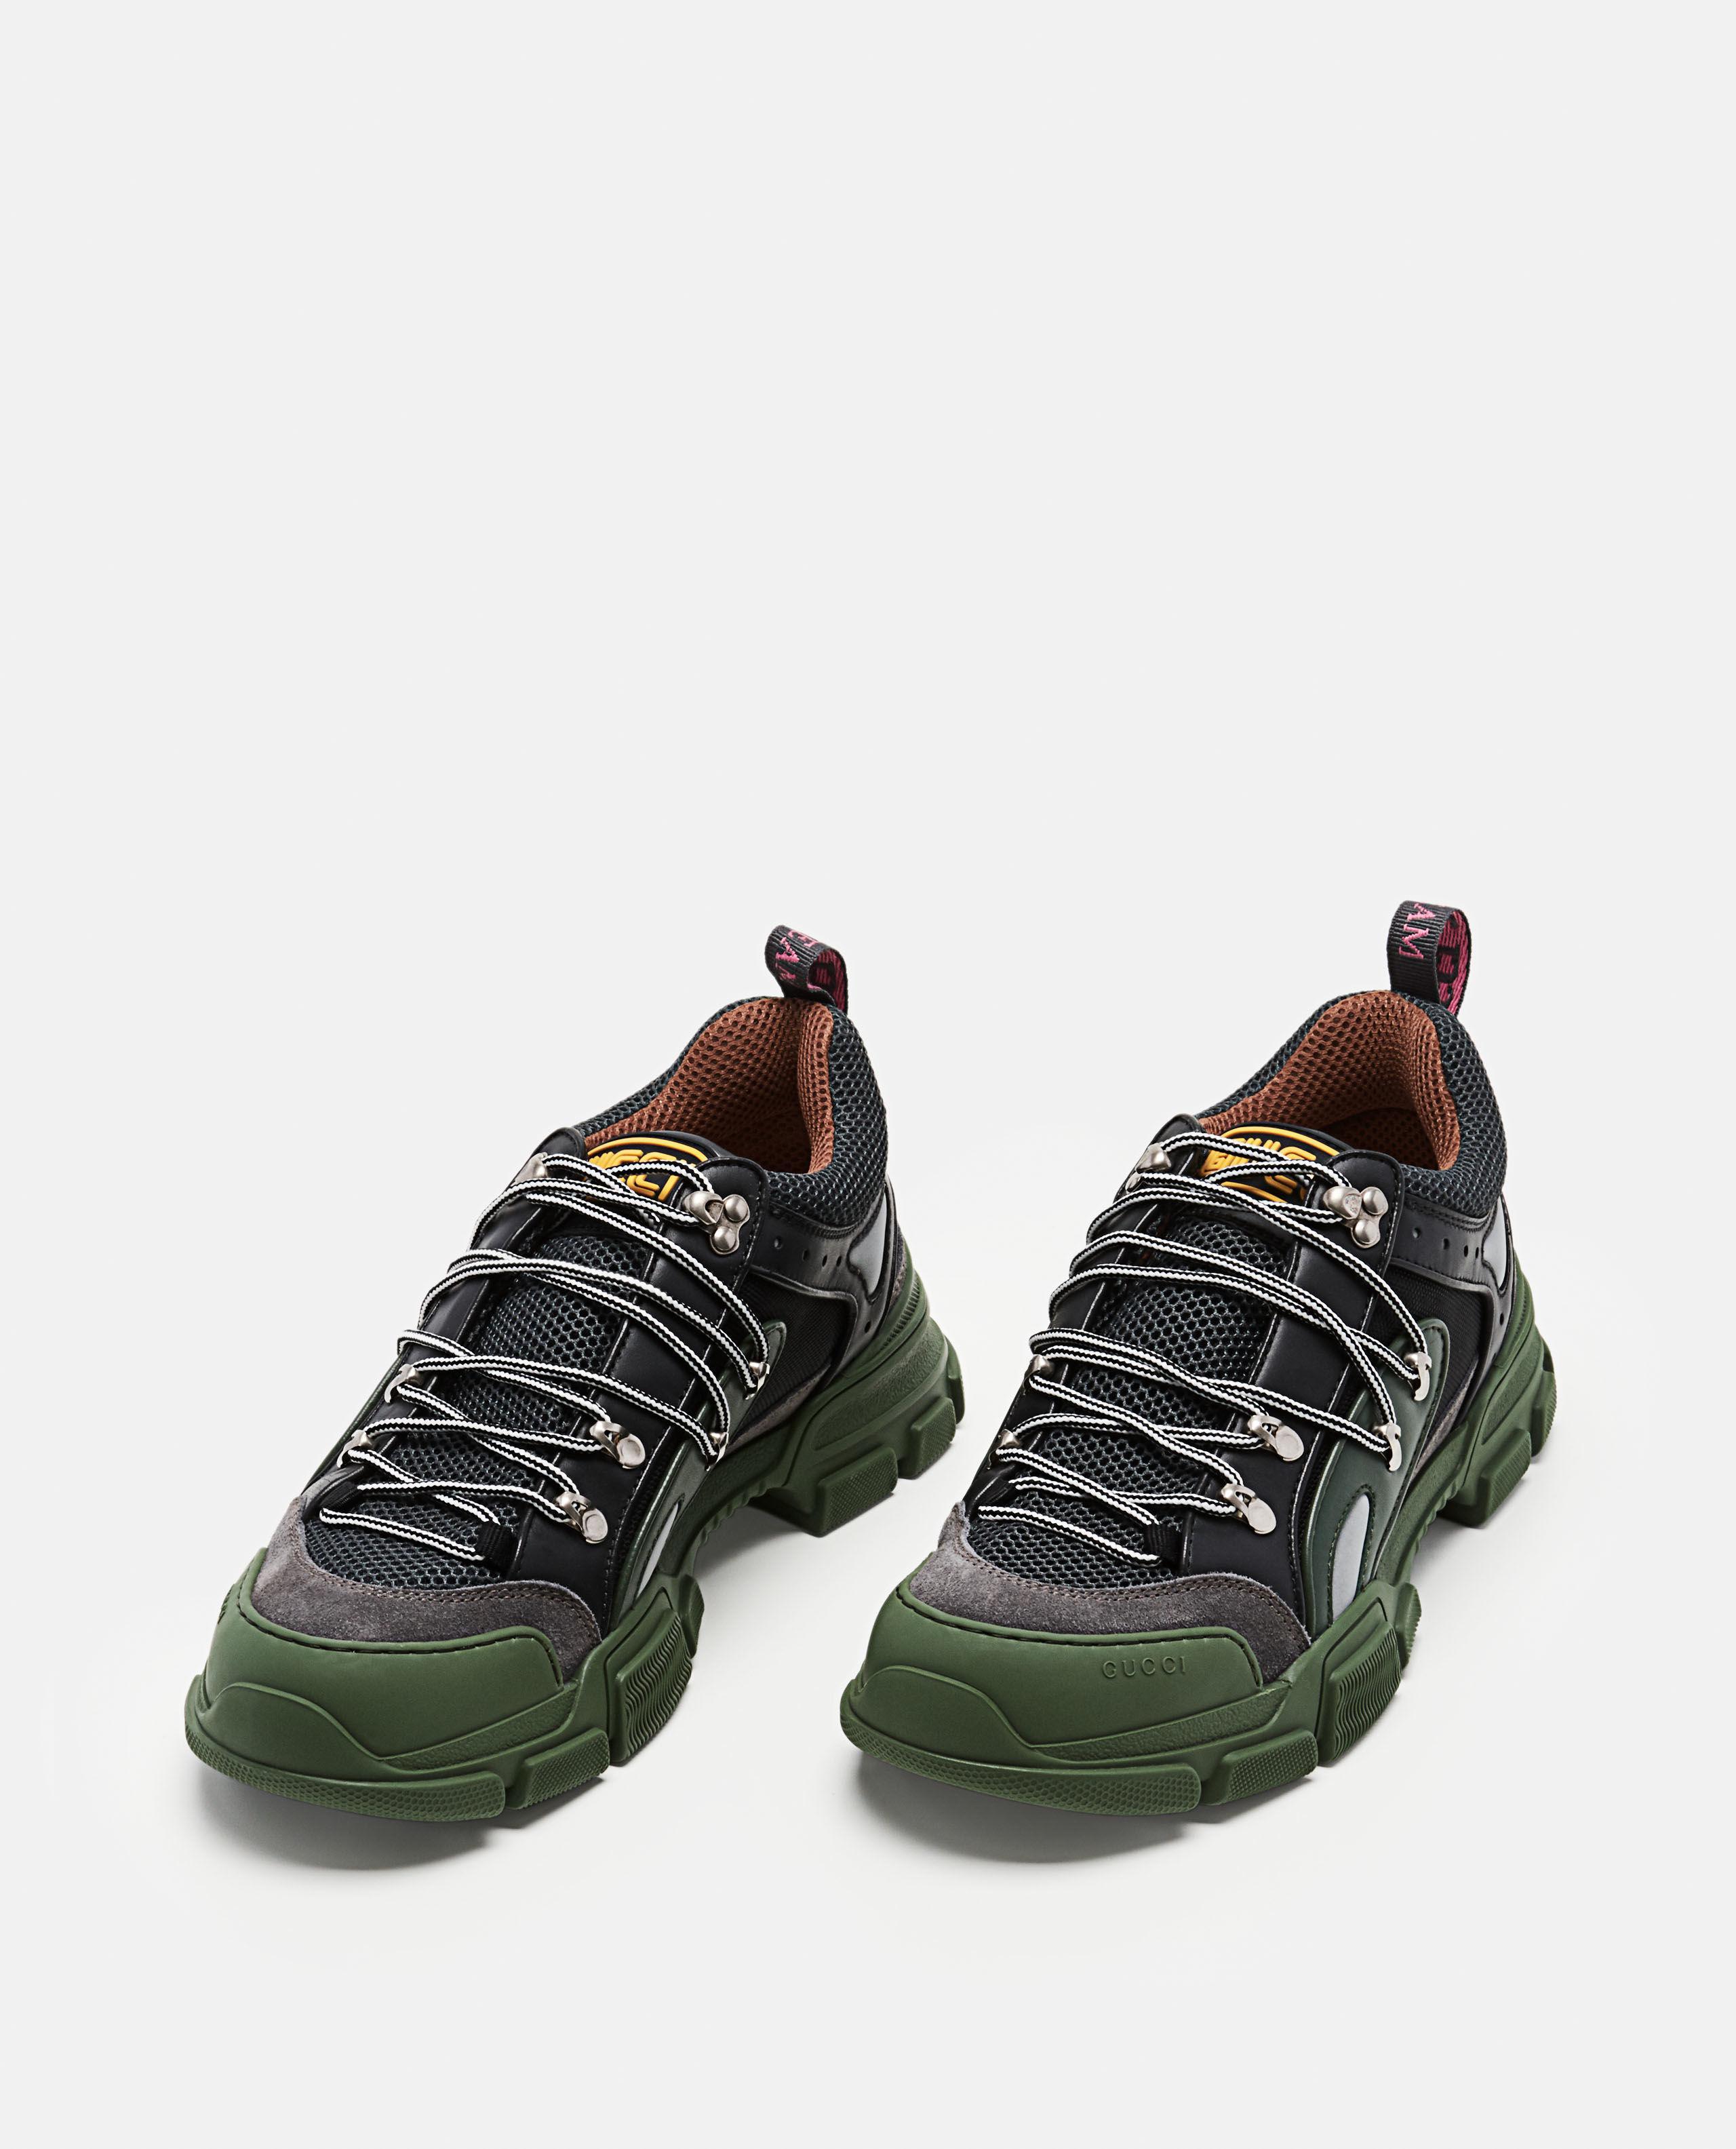 6b684cd89b58 Lyst - Gucci Flashtrek Sneaker in Black for Men